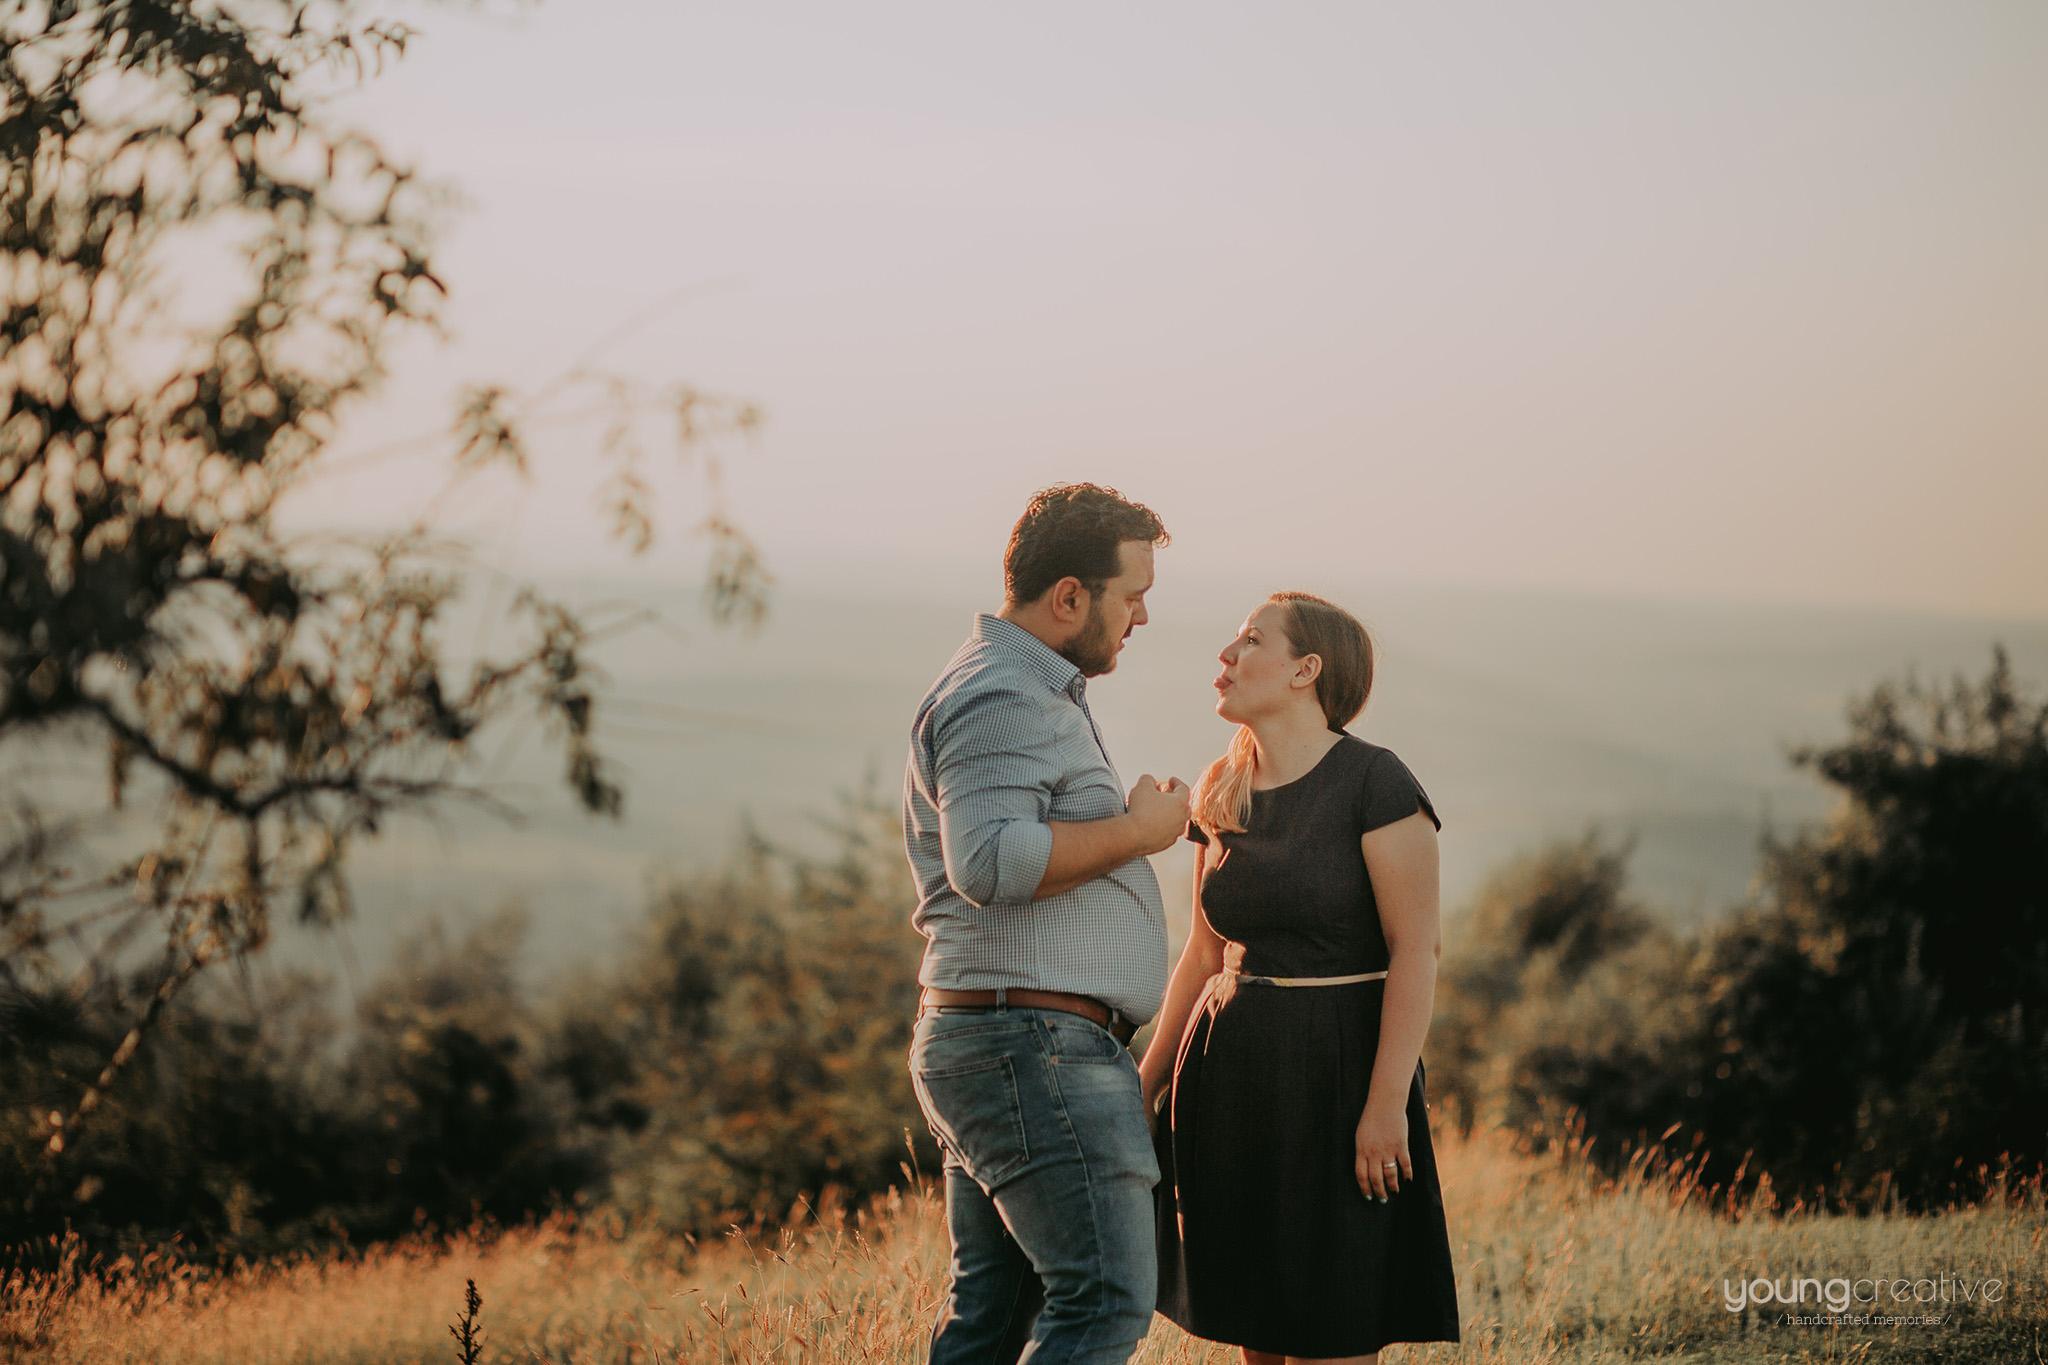 Simona & Cezar | youngcreative.info media | Dan Filipciuc, Cristina Bejan | fotografie de nunta Iasi